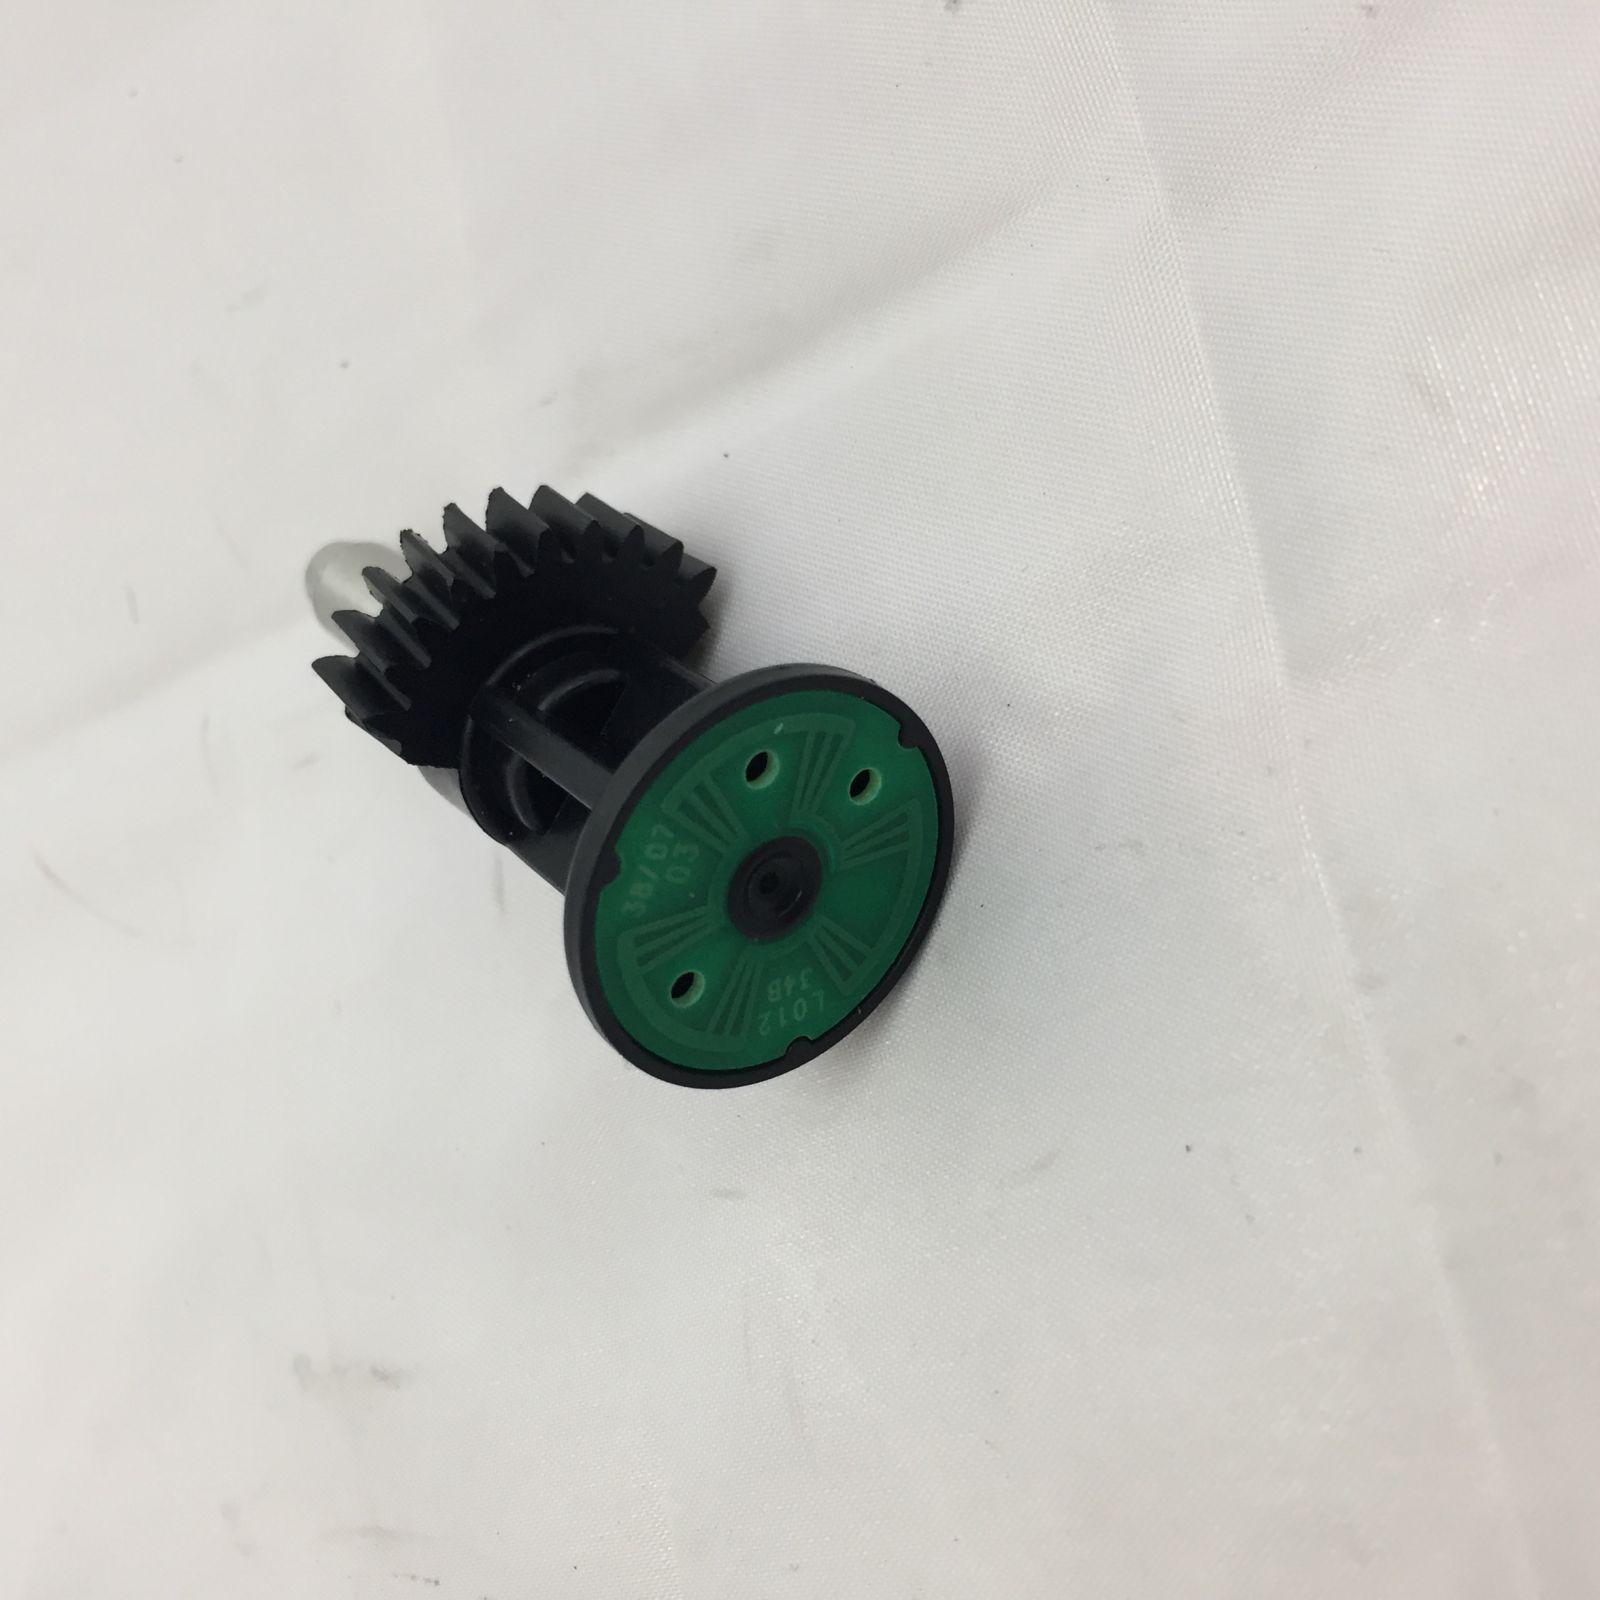 Gear with Position Sensor for REA Hella, Garrett